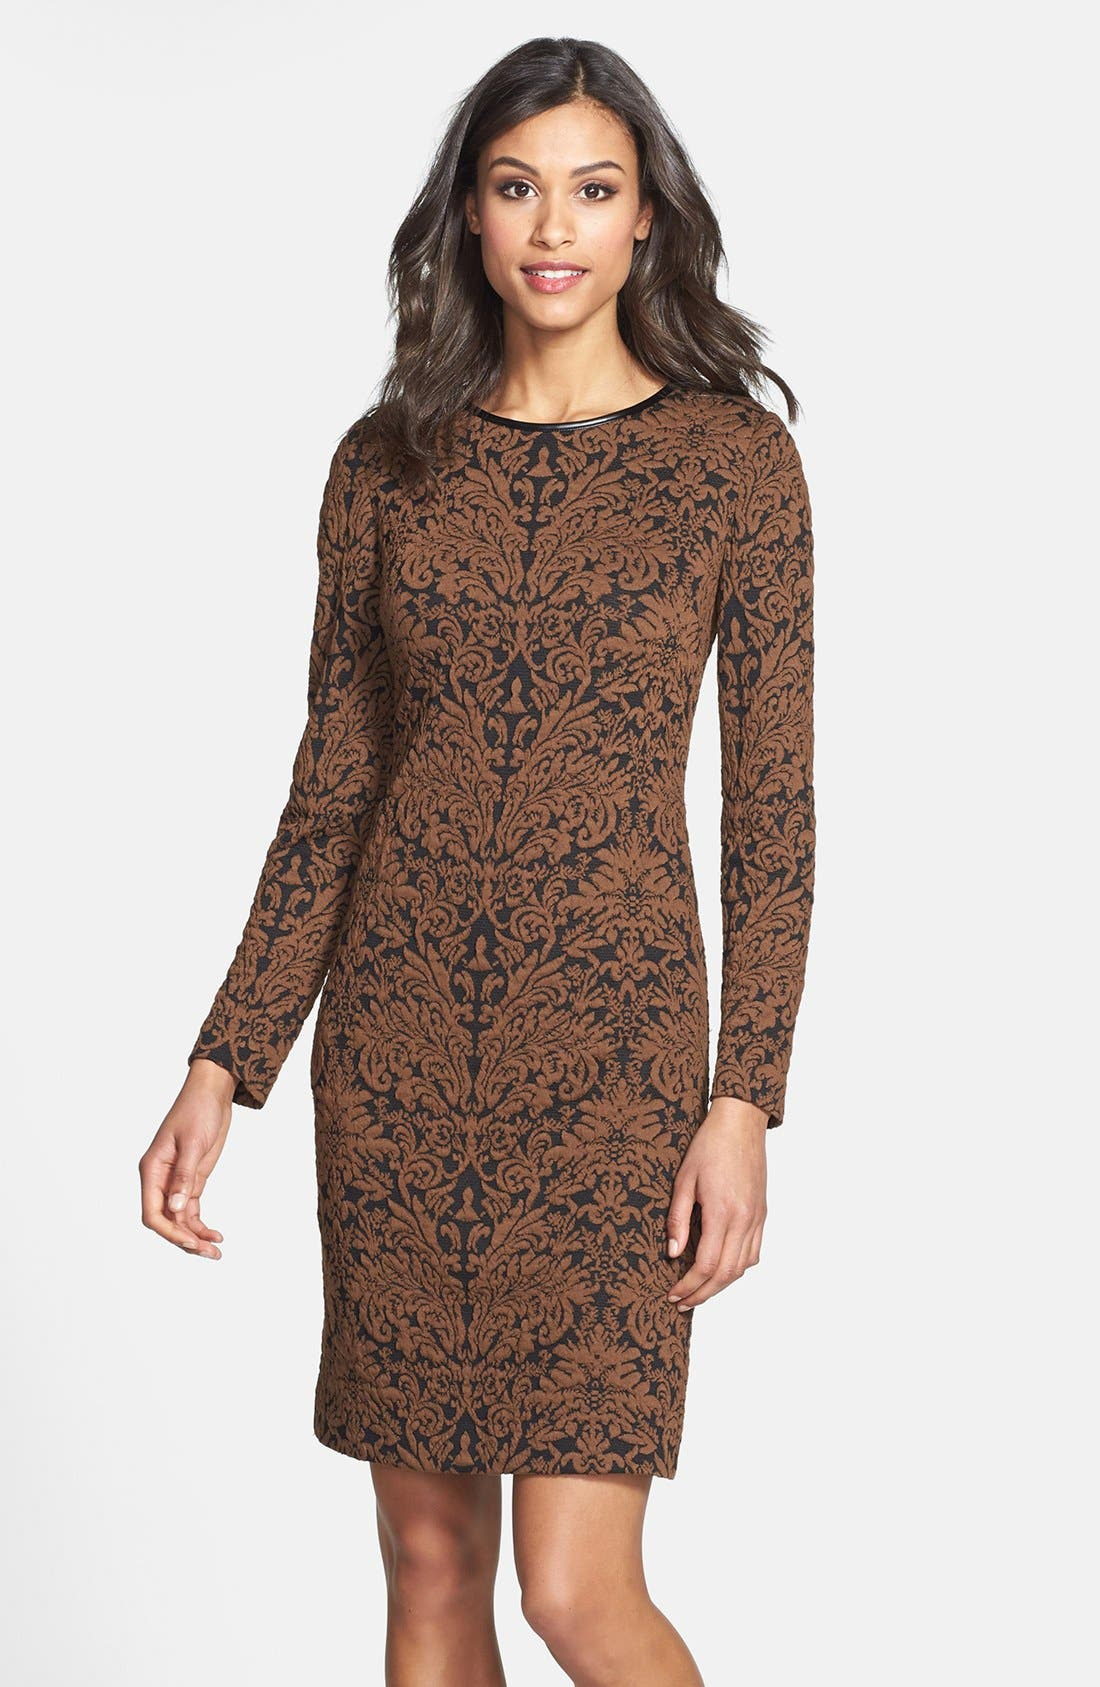 Alternate Image 1 Selected - Vince Camuto Long Sleeve Jacquard Sheath Dress (Regular & Petite)